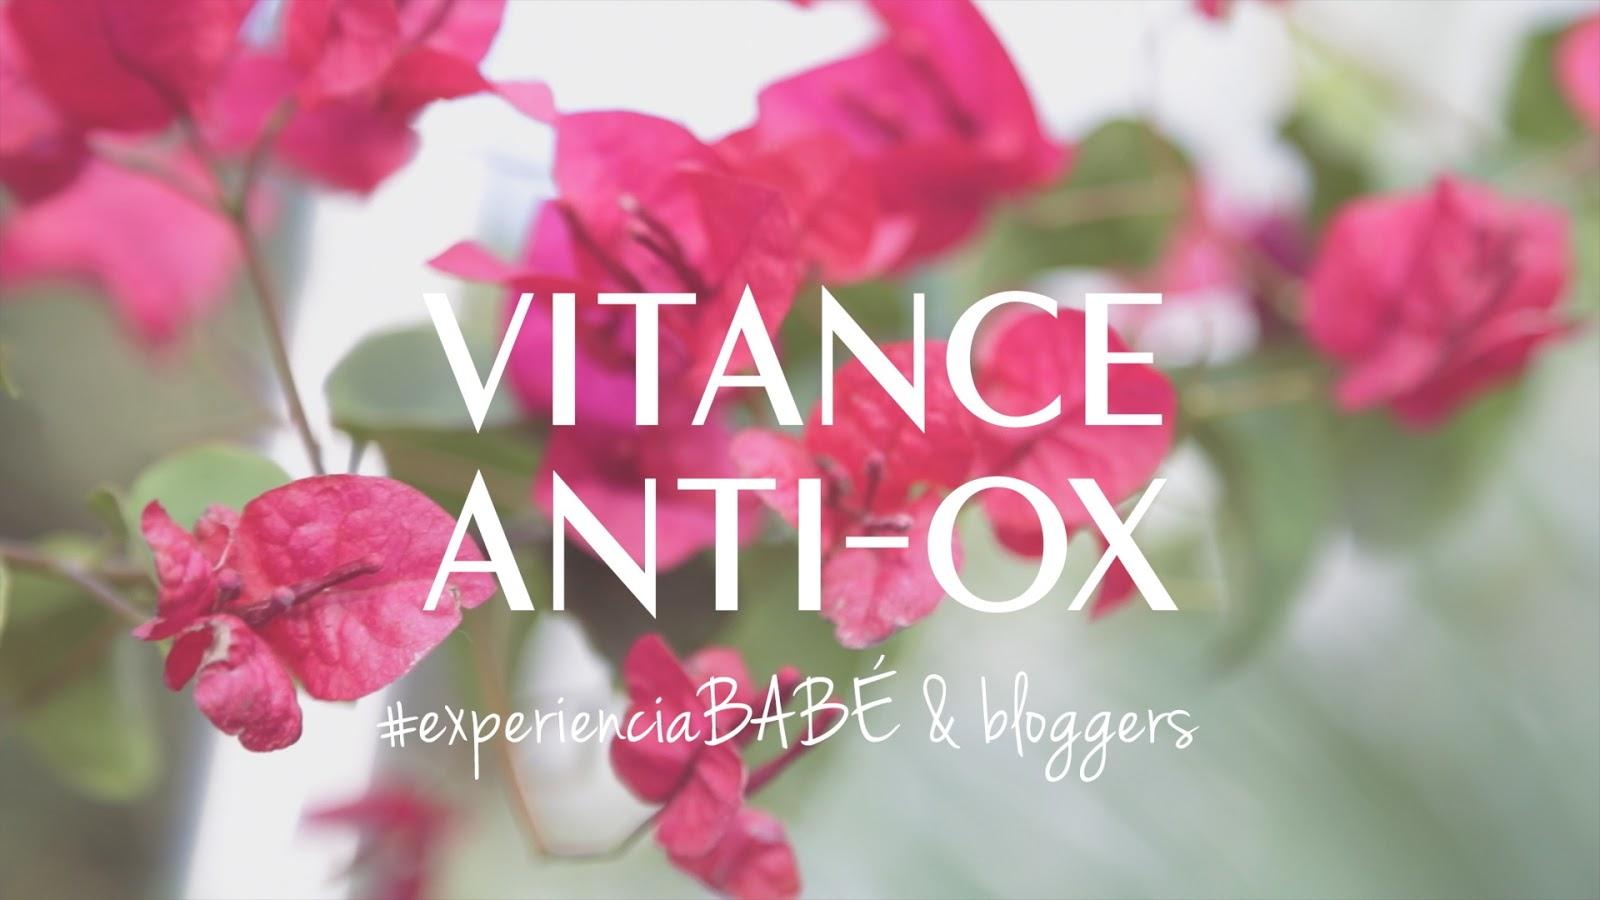 VITANCE ANTI-OX Laboratorios Babé skincare